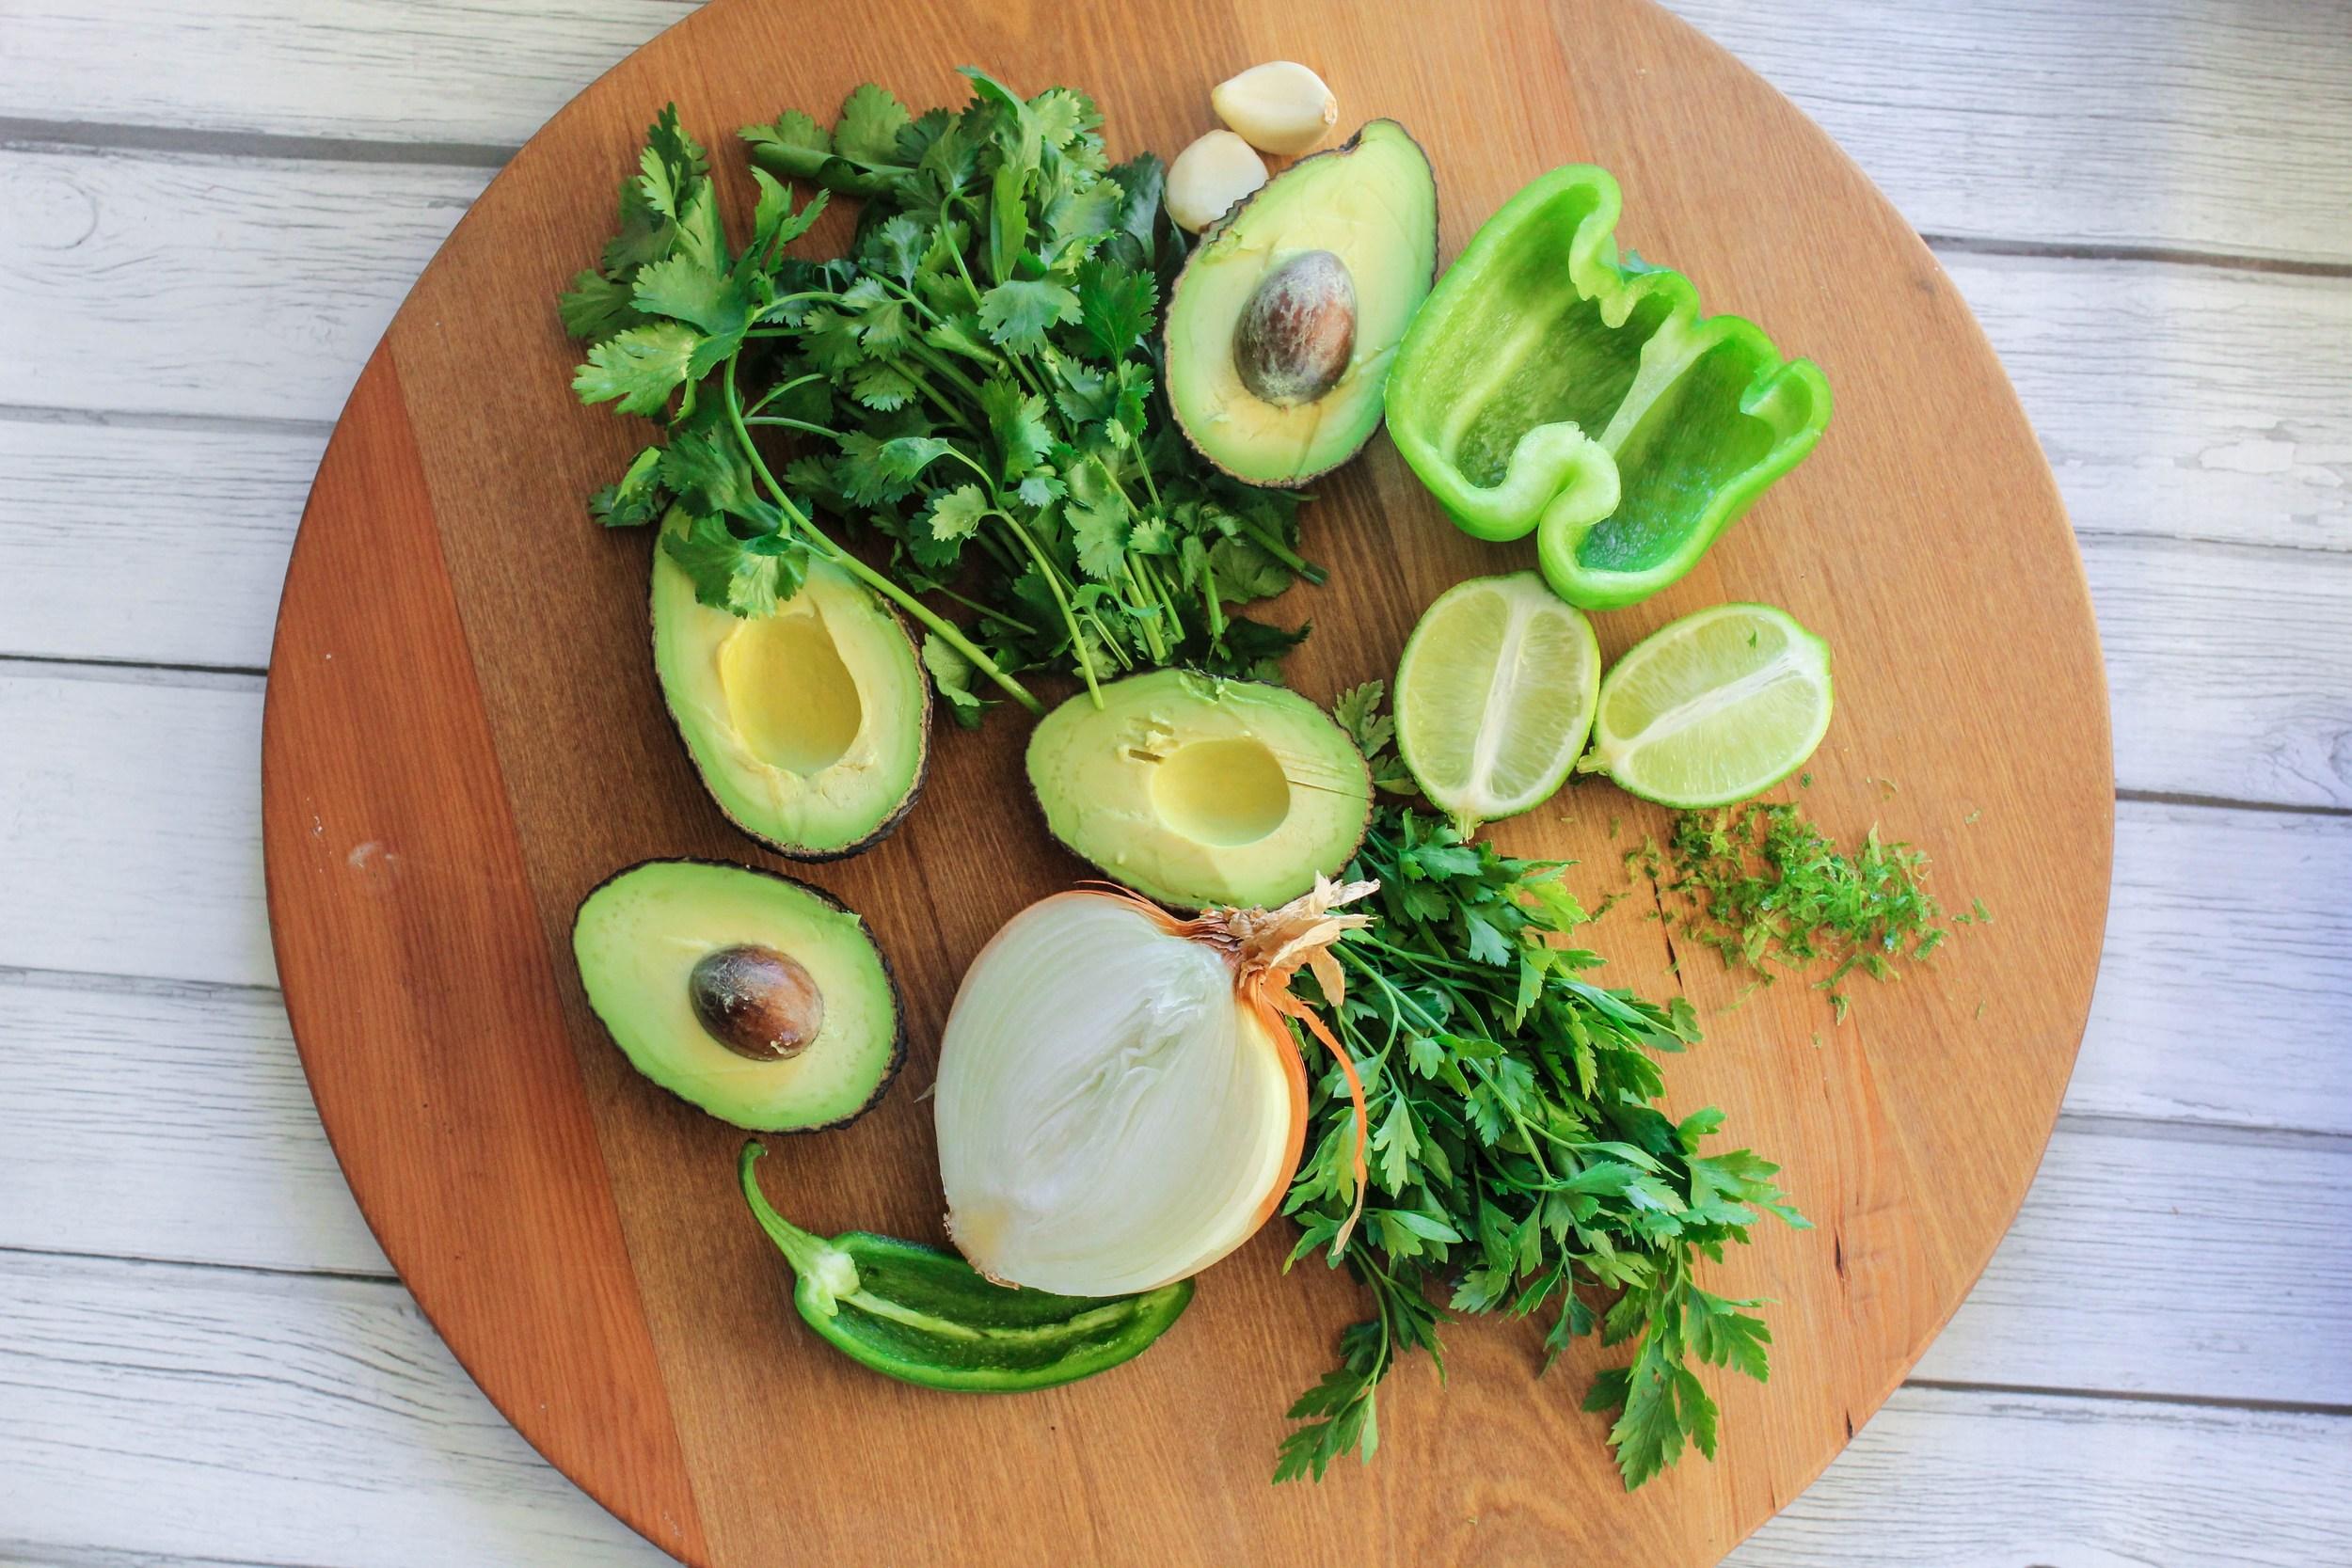 Vegan_Guasaca_Ingredients_by_Sandrachile.com